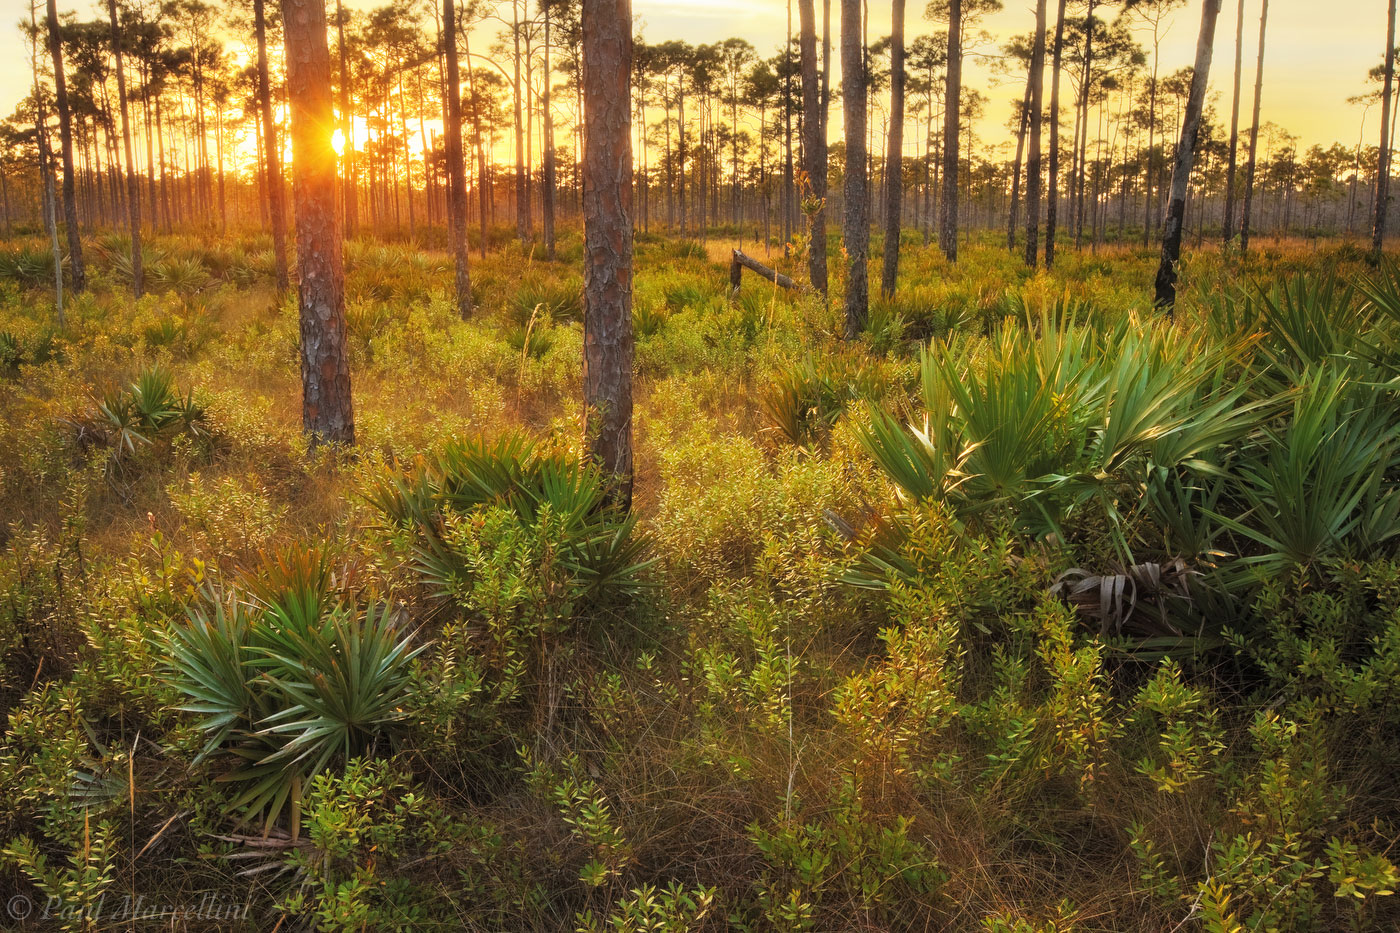 pine flatwoods, jonathan dickinson, central florida, sunset, florida, south florida, nature, photography, photo